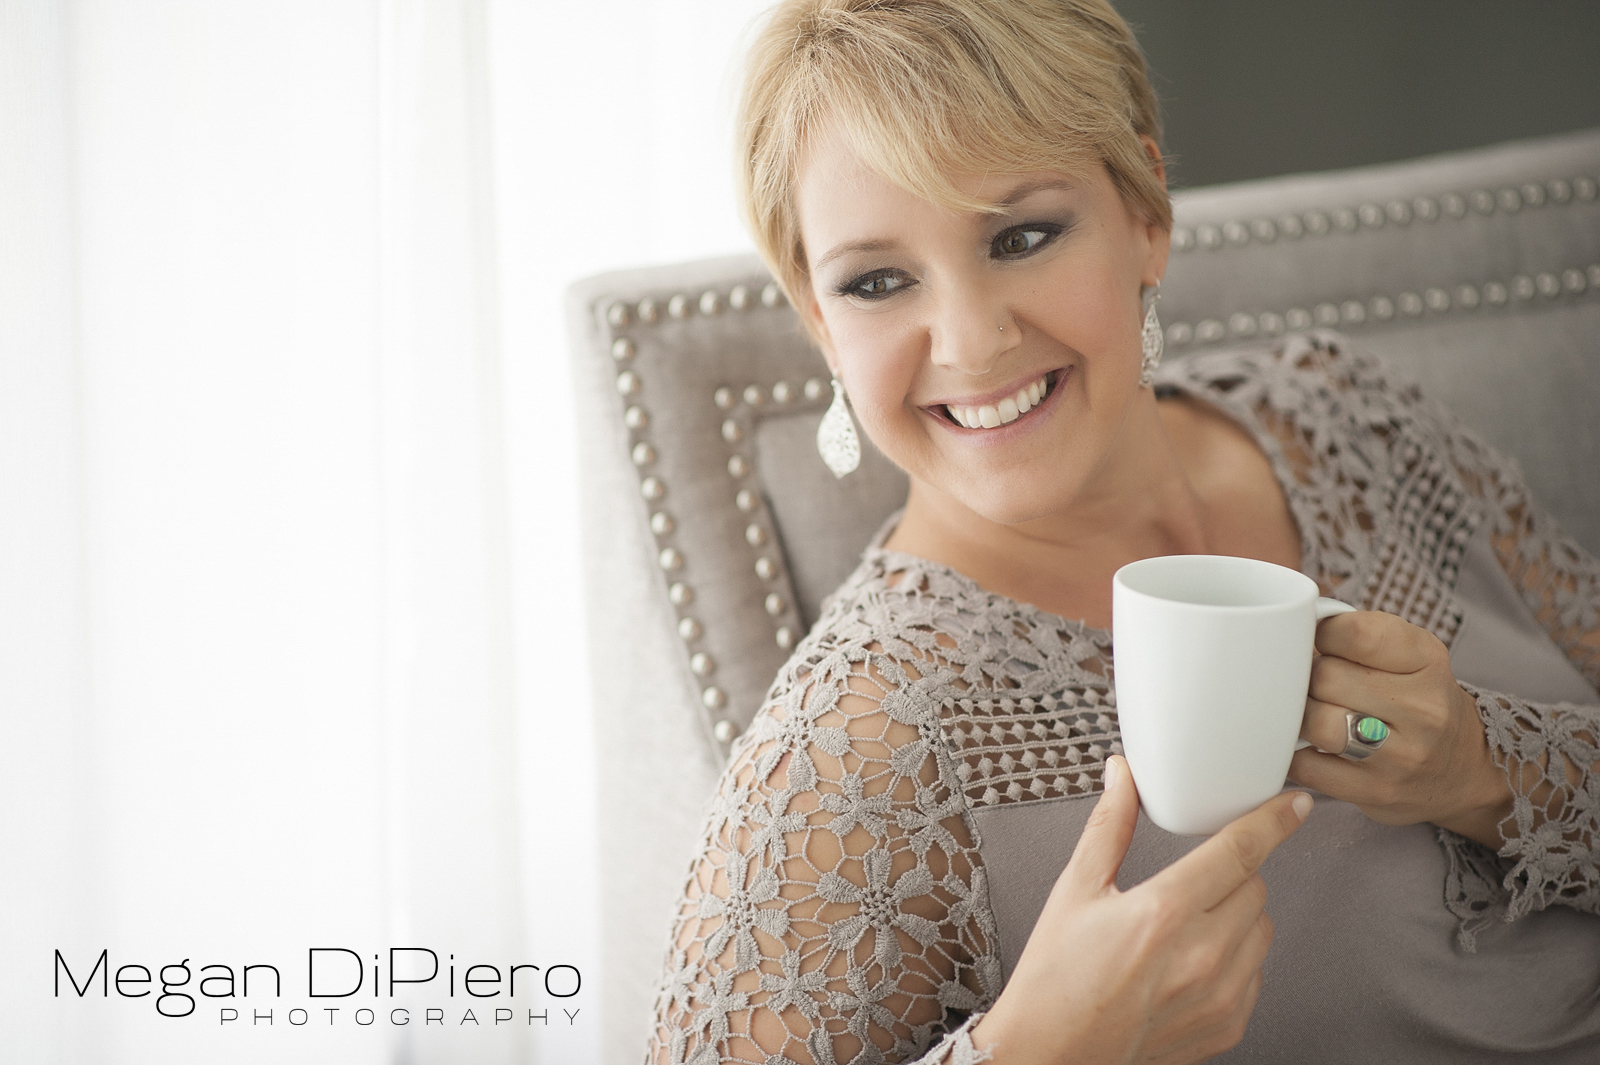 Megan DiPiero Photography {Personal Branding Business Headshots}